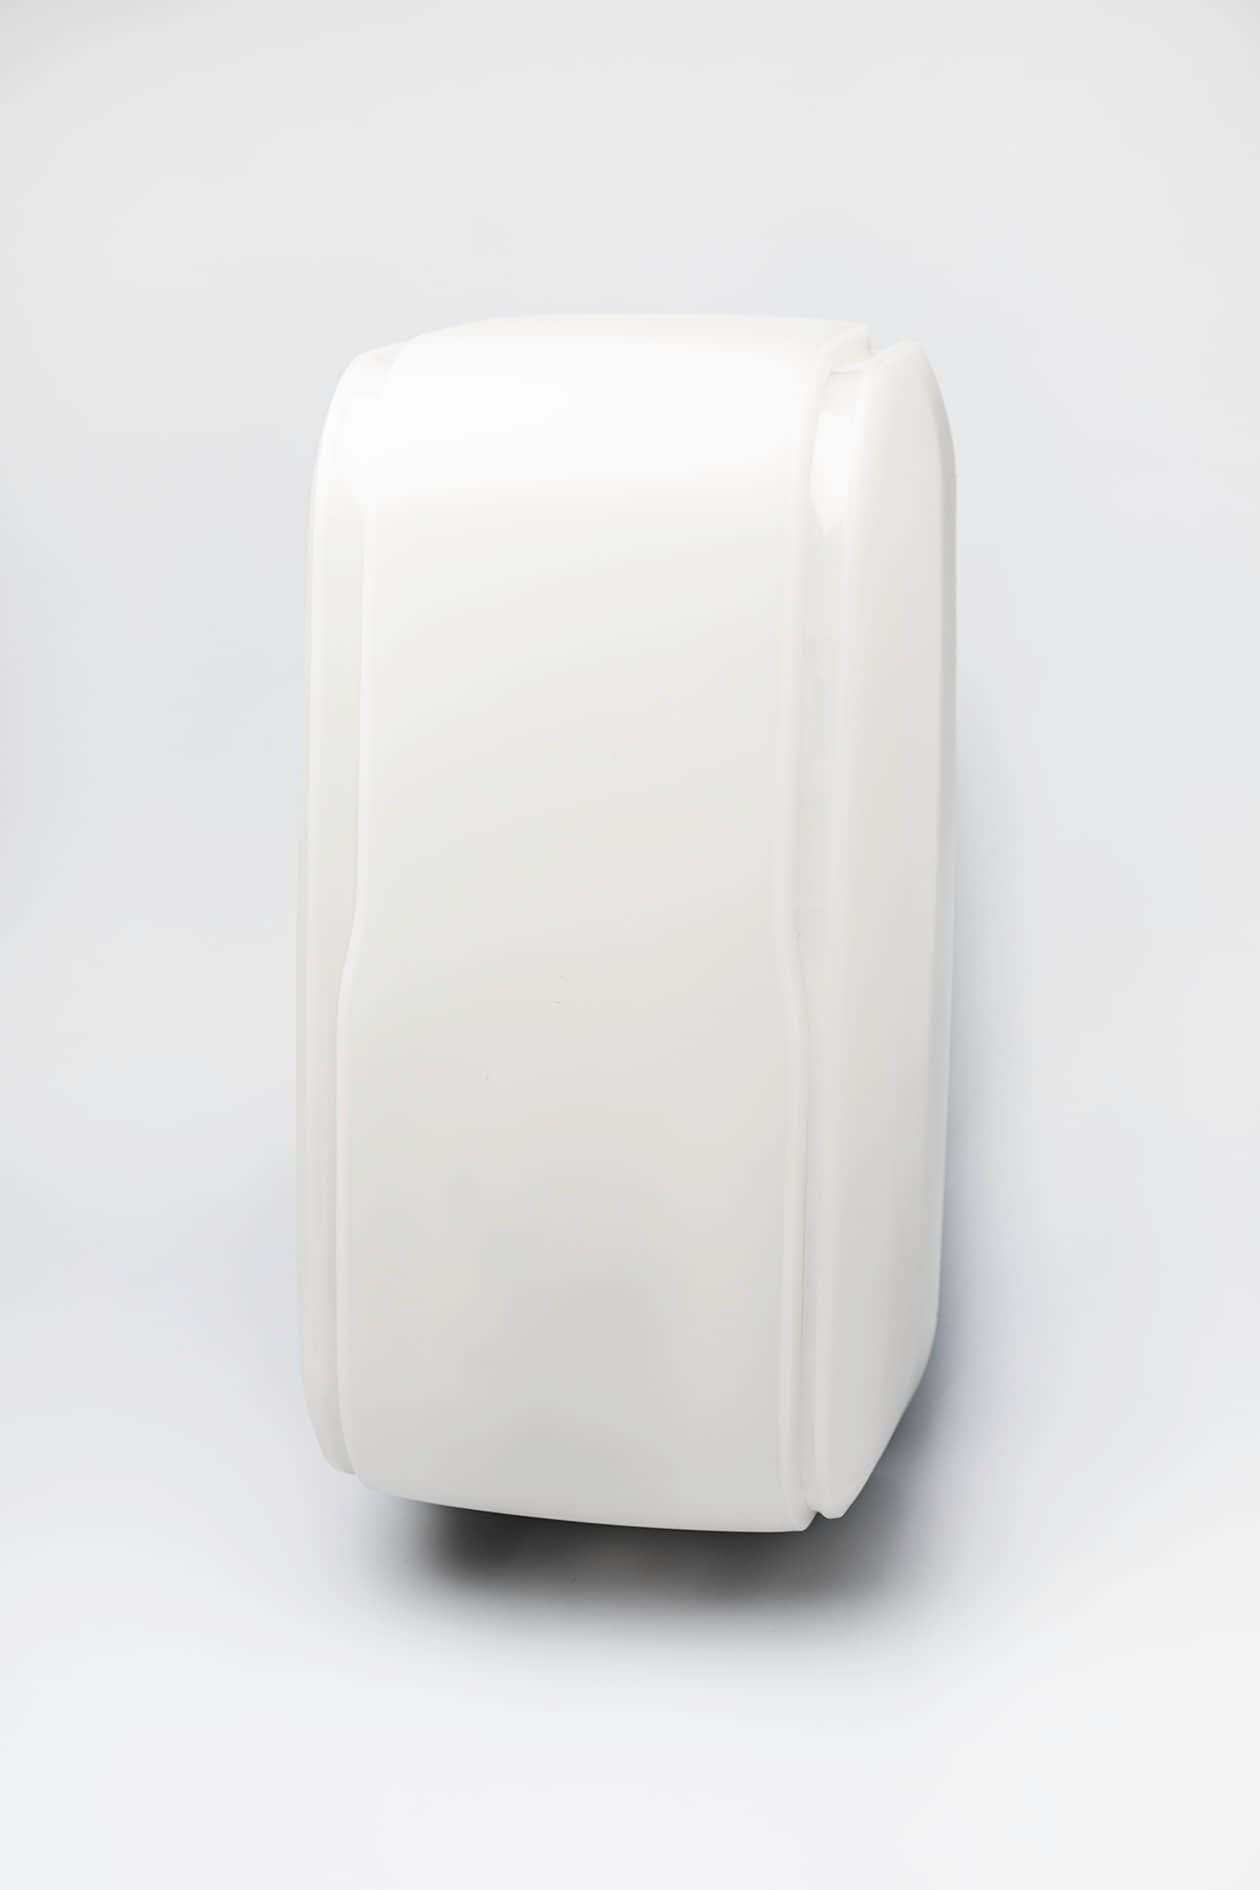 Desinfektionsmittelspender Berührungslos mit Sensor von Sani Air Austria